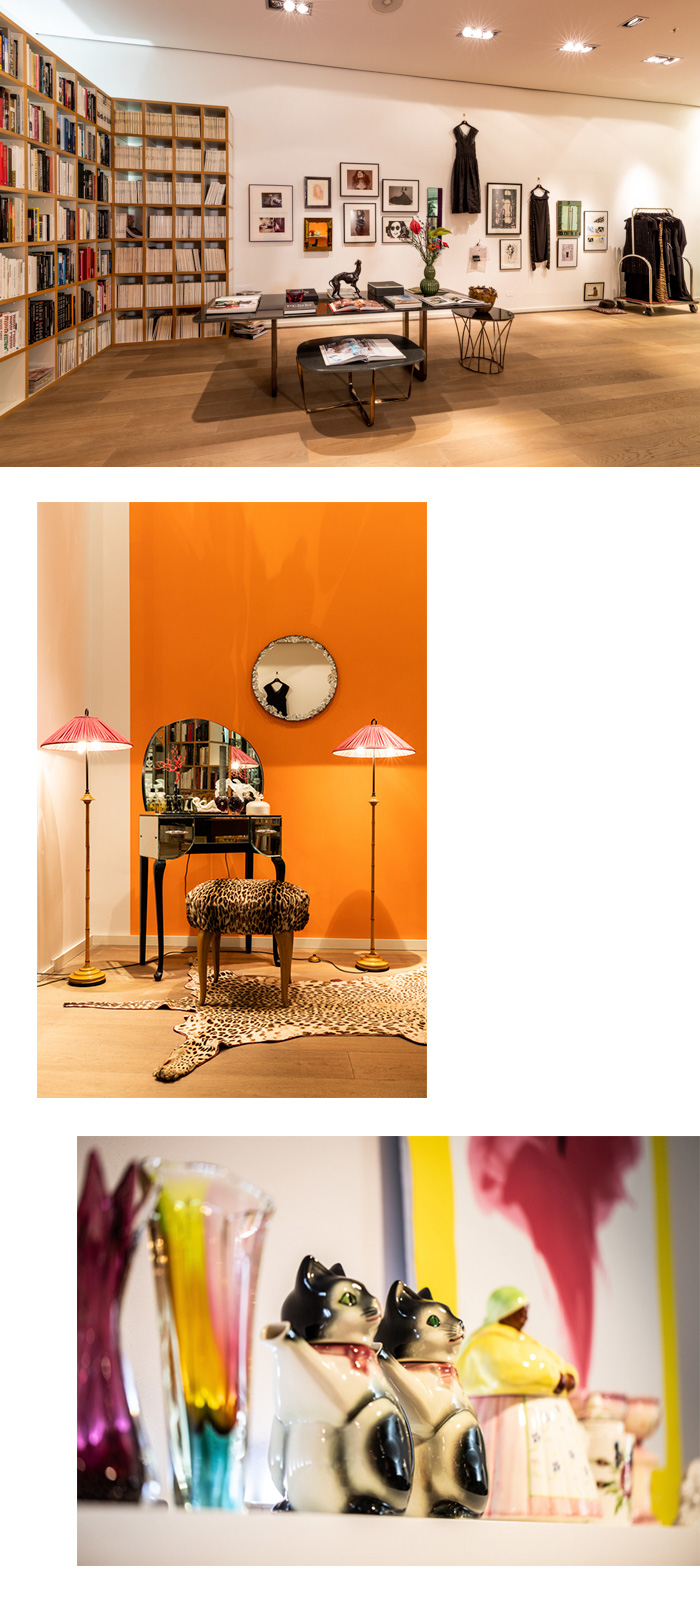 Angelica Blechschmidt - A life in style - Ausstellung |Secondella